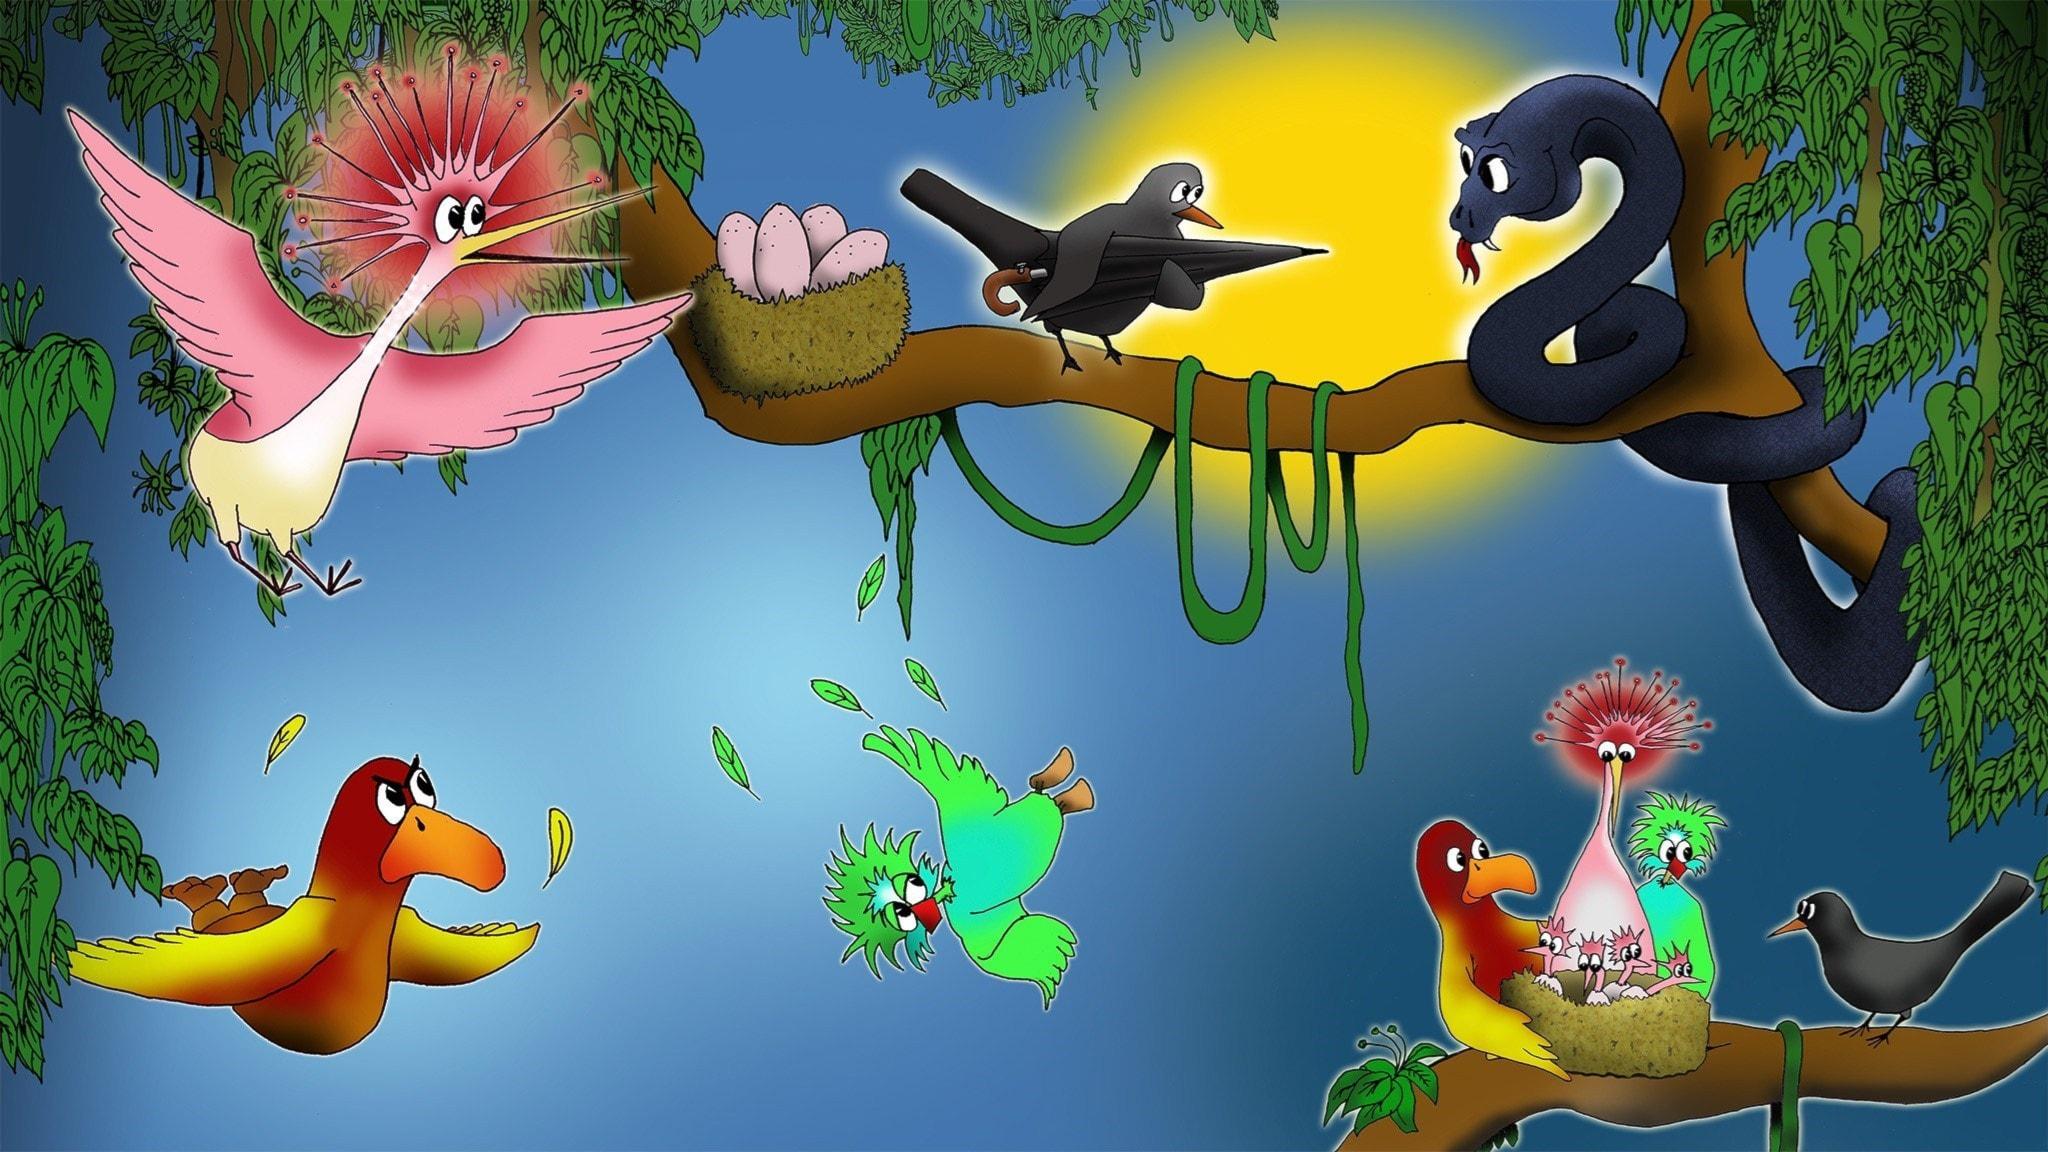 Svarta lilla koltrast del 5. Illustration: Homero Alvarez.